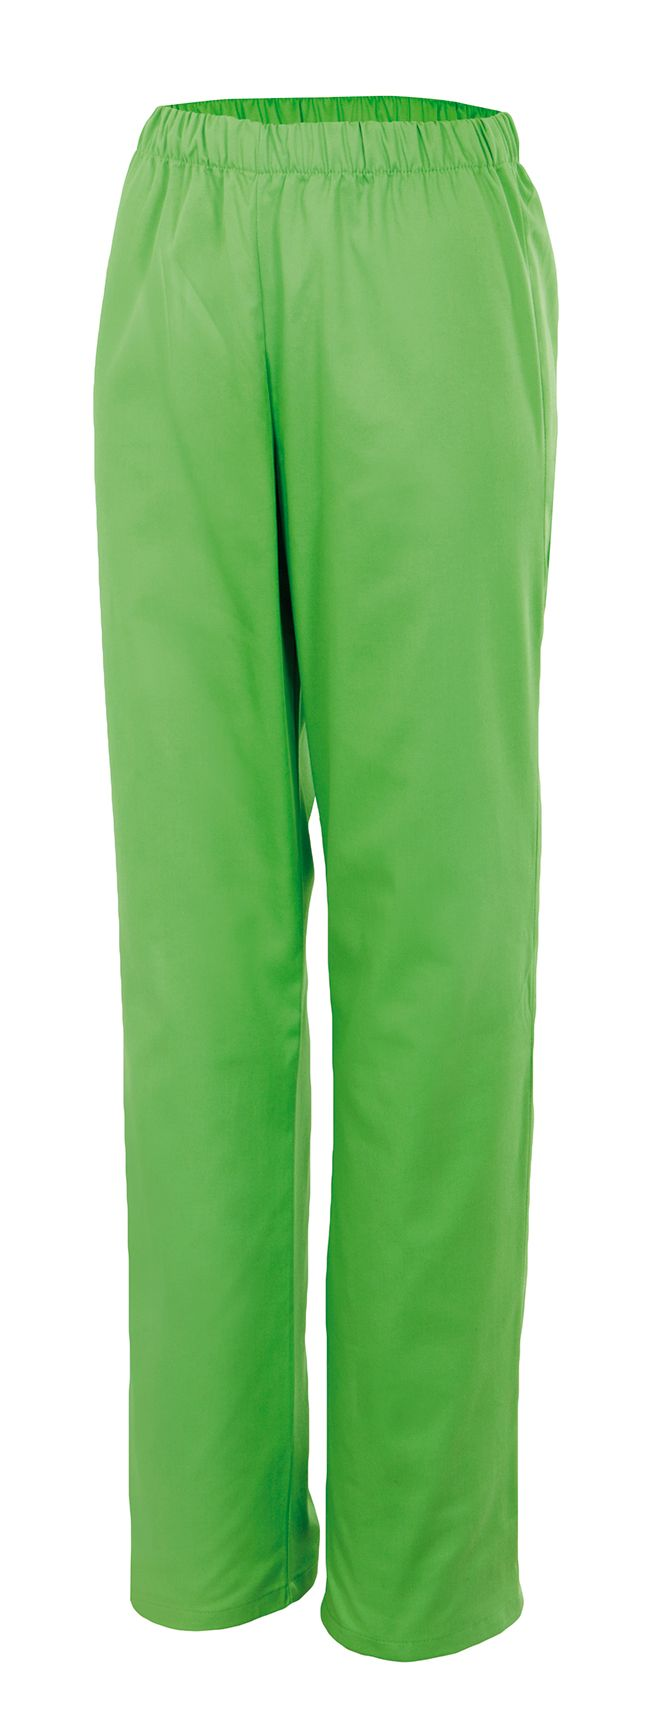 333 Pantalón pijama: Catálogo de Mòn Laboral